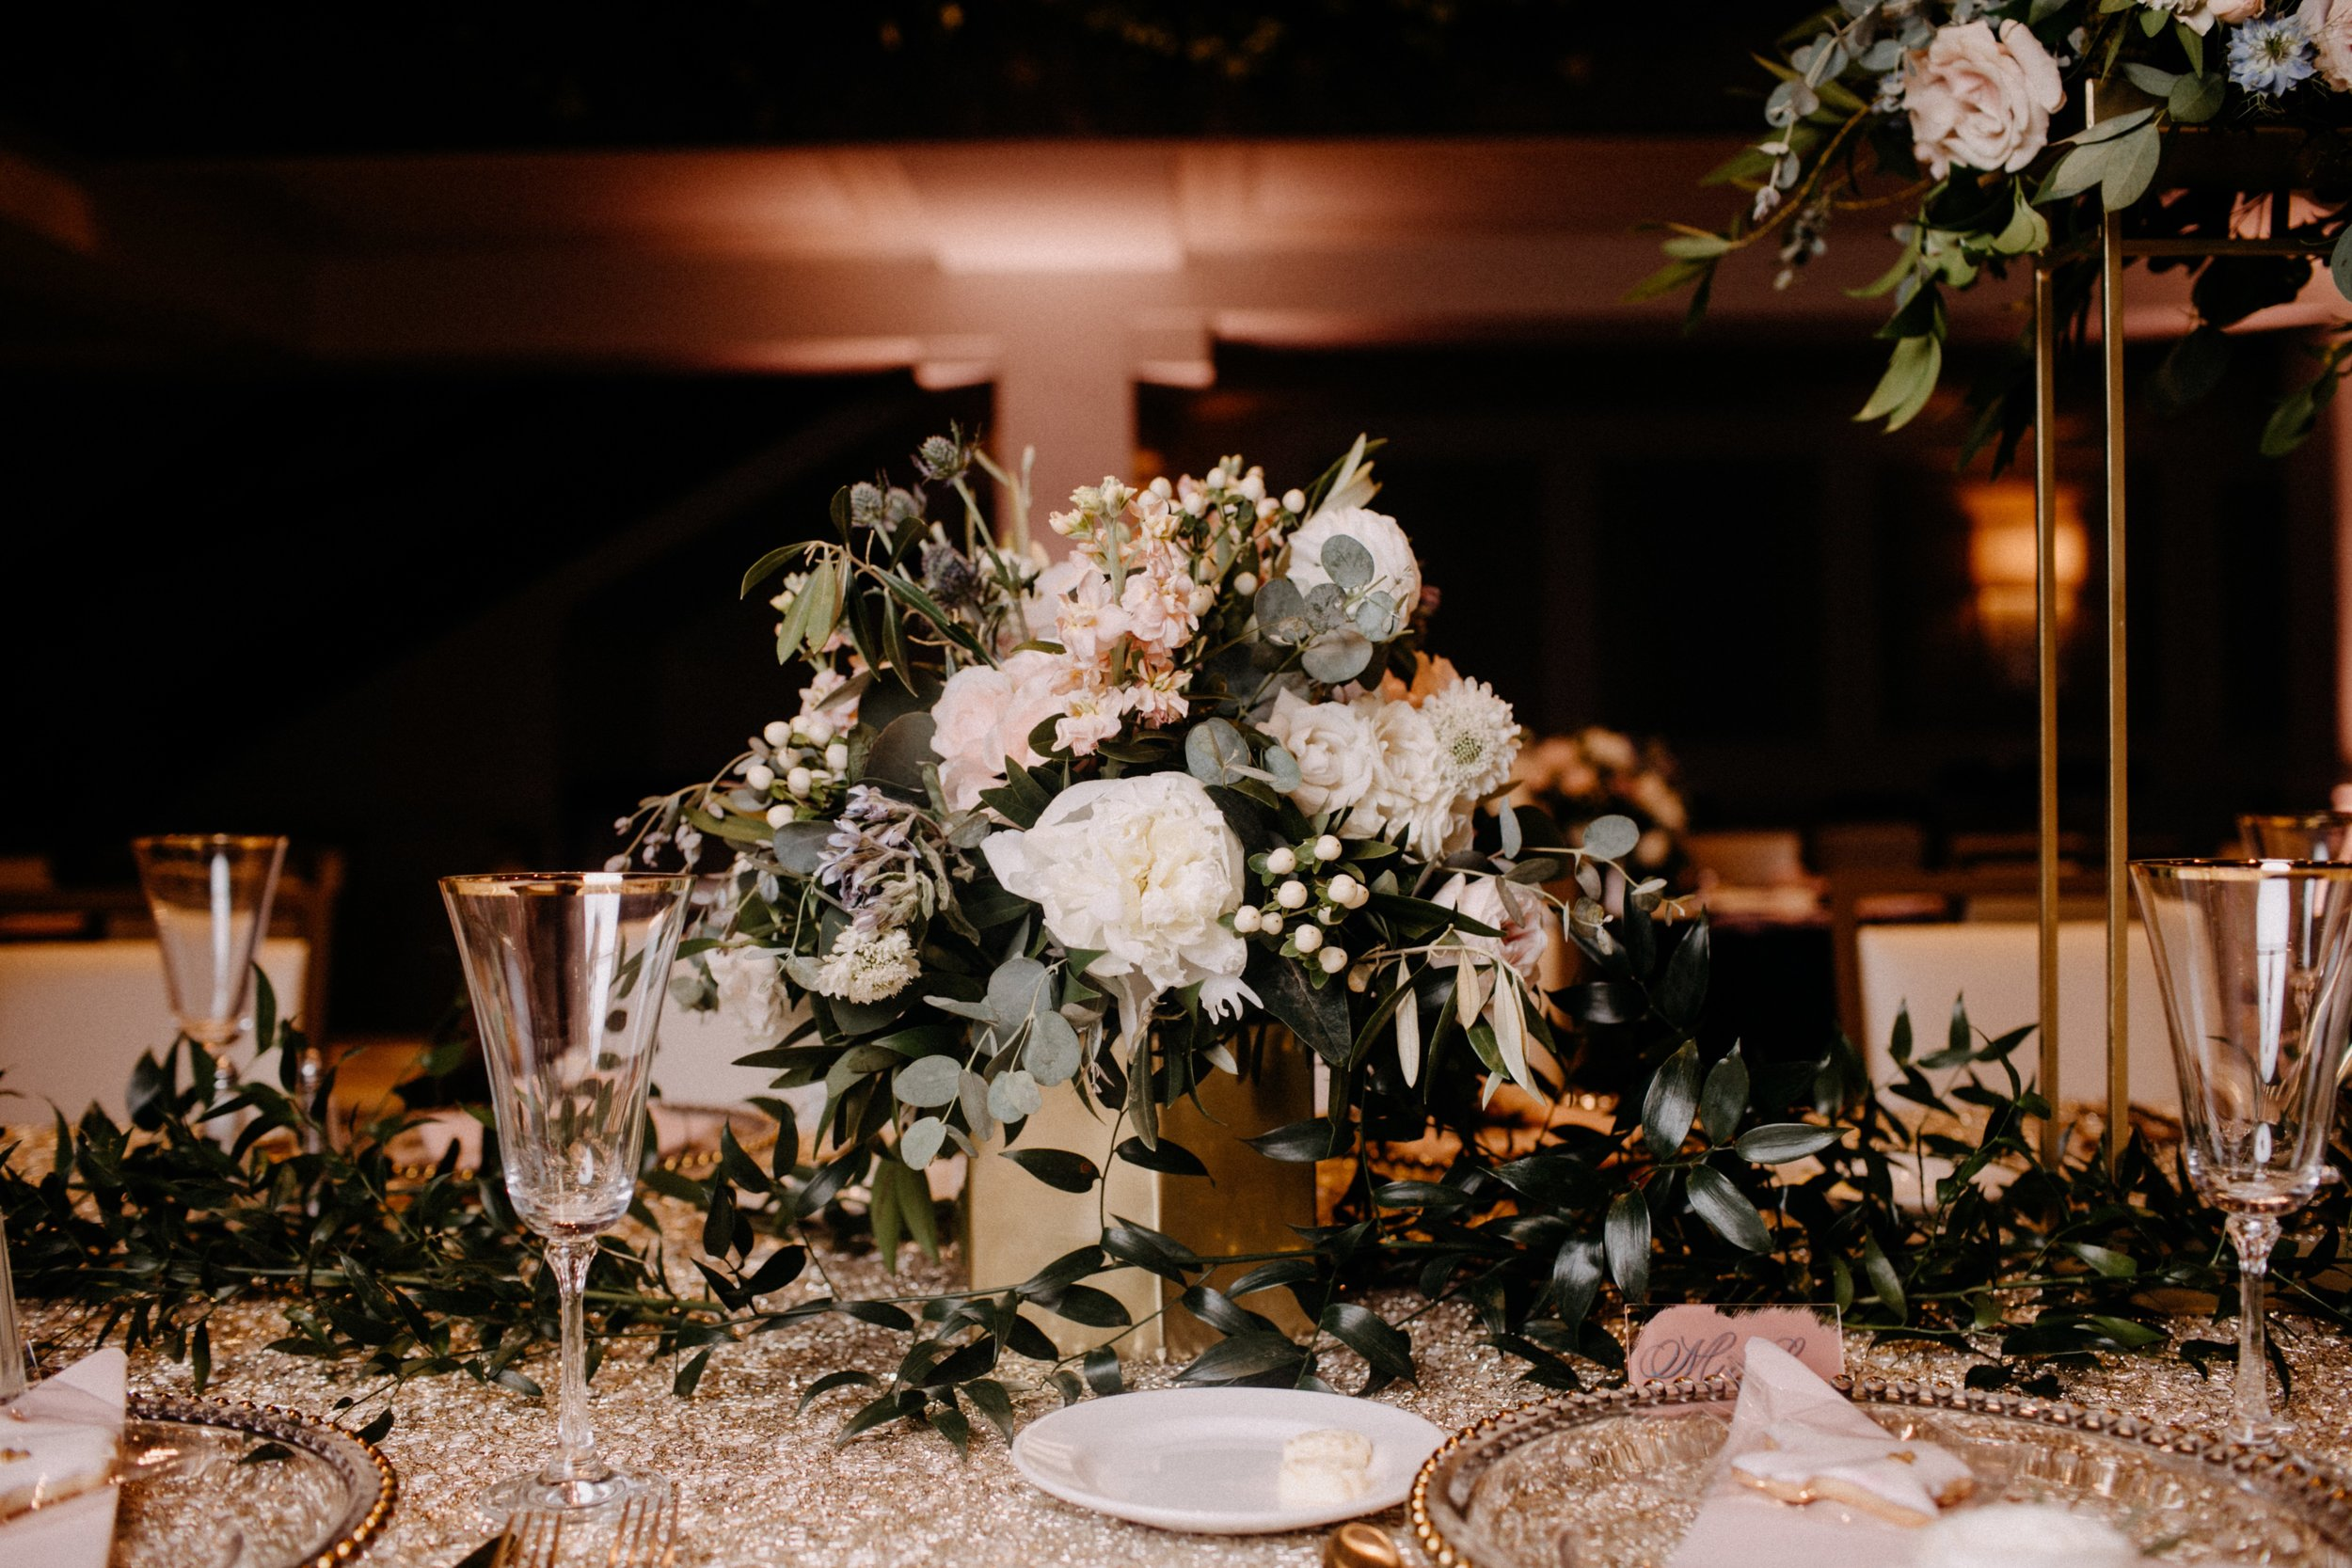 st-anthony-hotel-wedding-photography-10090san-antonio.JPG